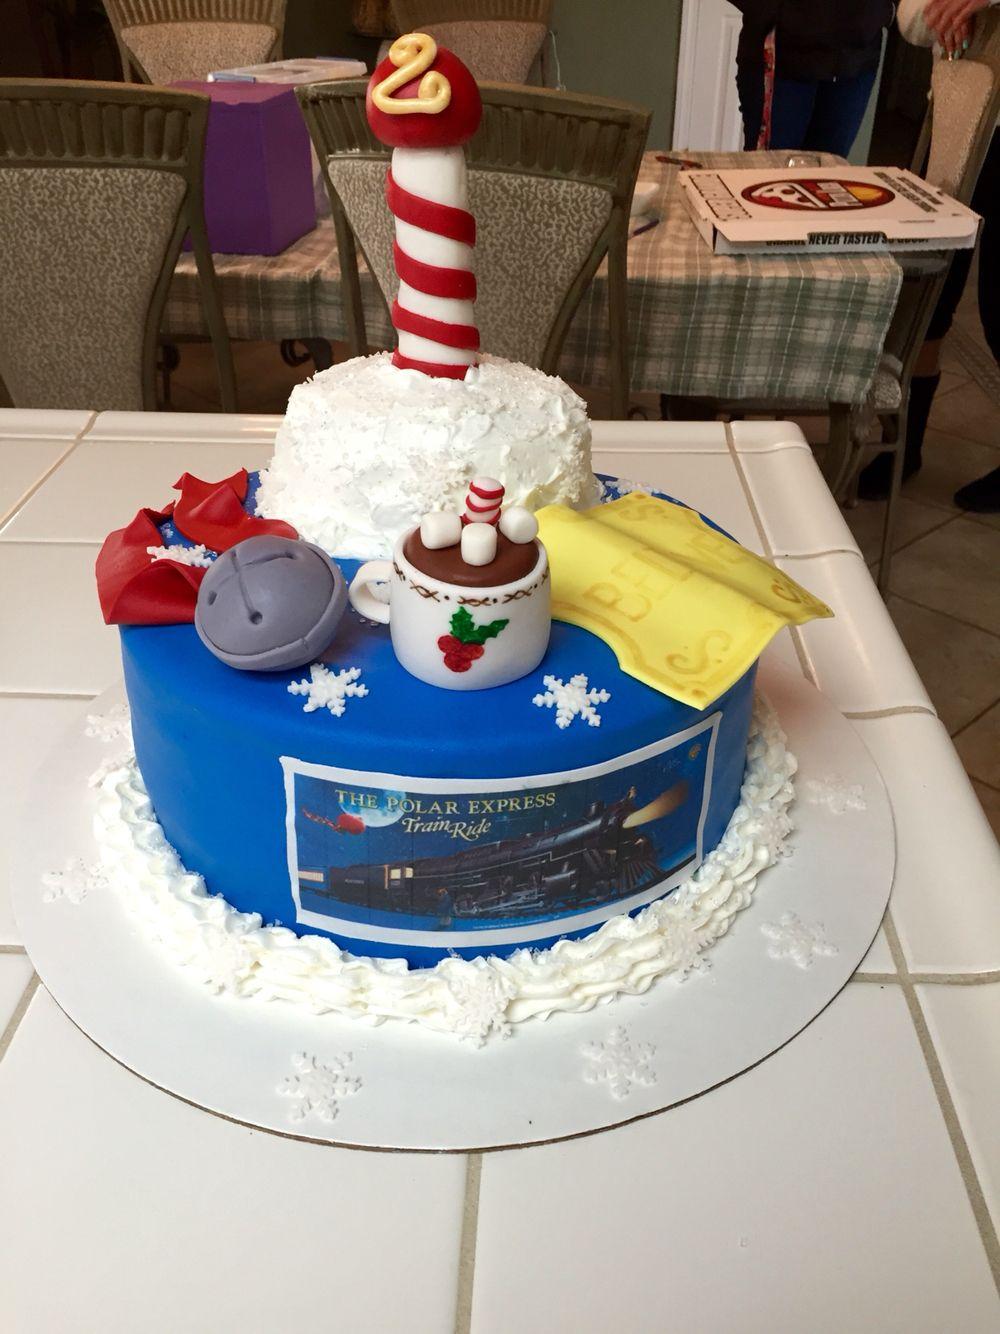 Astonishing Polar Express Cake Polar Express Birthday Cake Polar Express Funny Birthday Cards Online Elaedamsfinfo